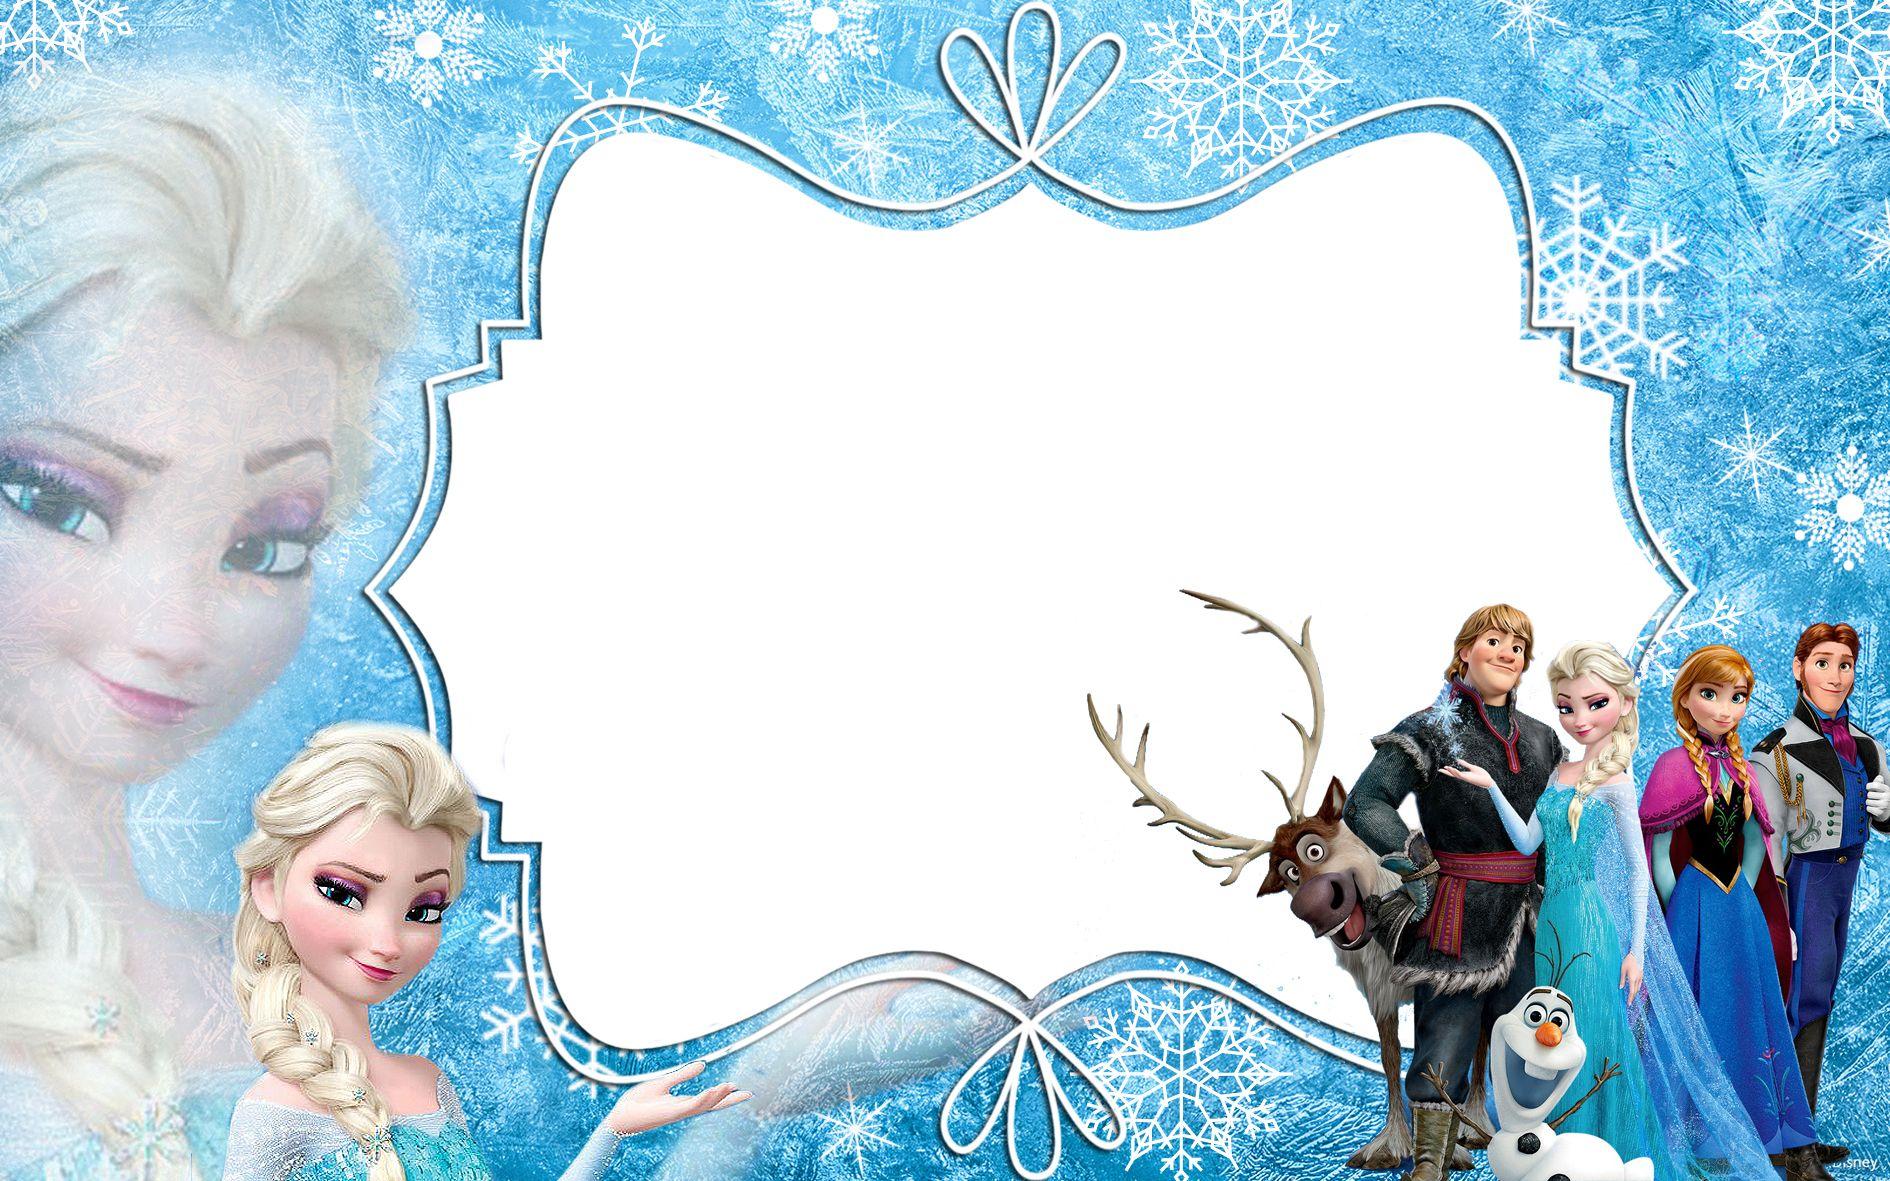 Daftar Wallpaper Frozen Design | Download Koleksi ...